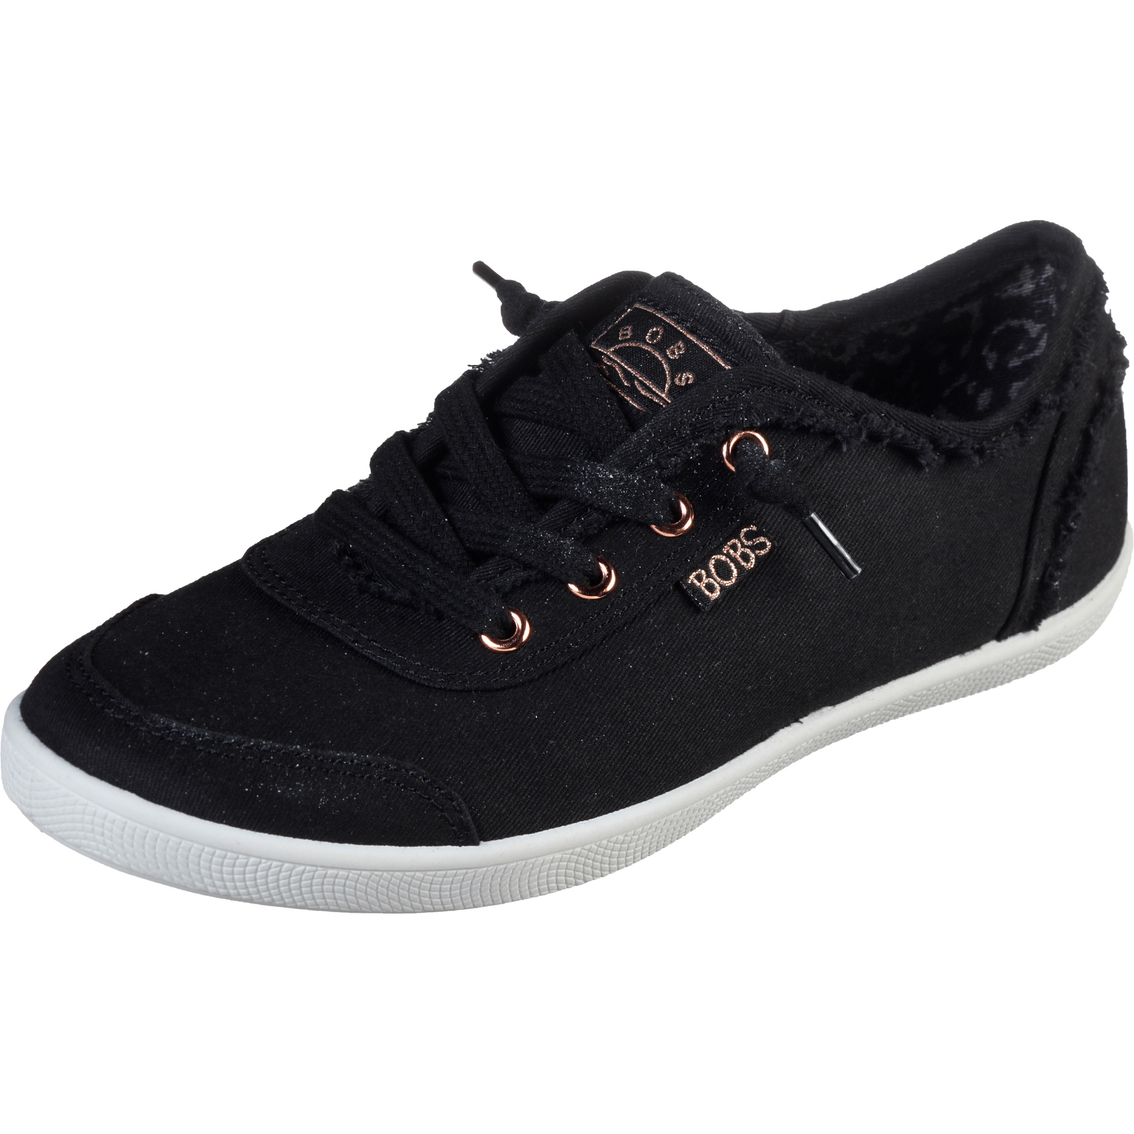 Bobs B Cute Sneakers | Sneakers | Shoes